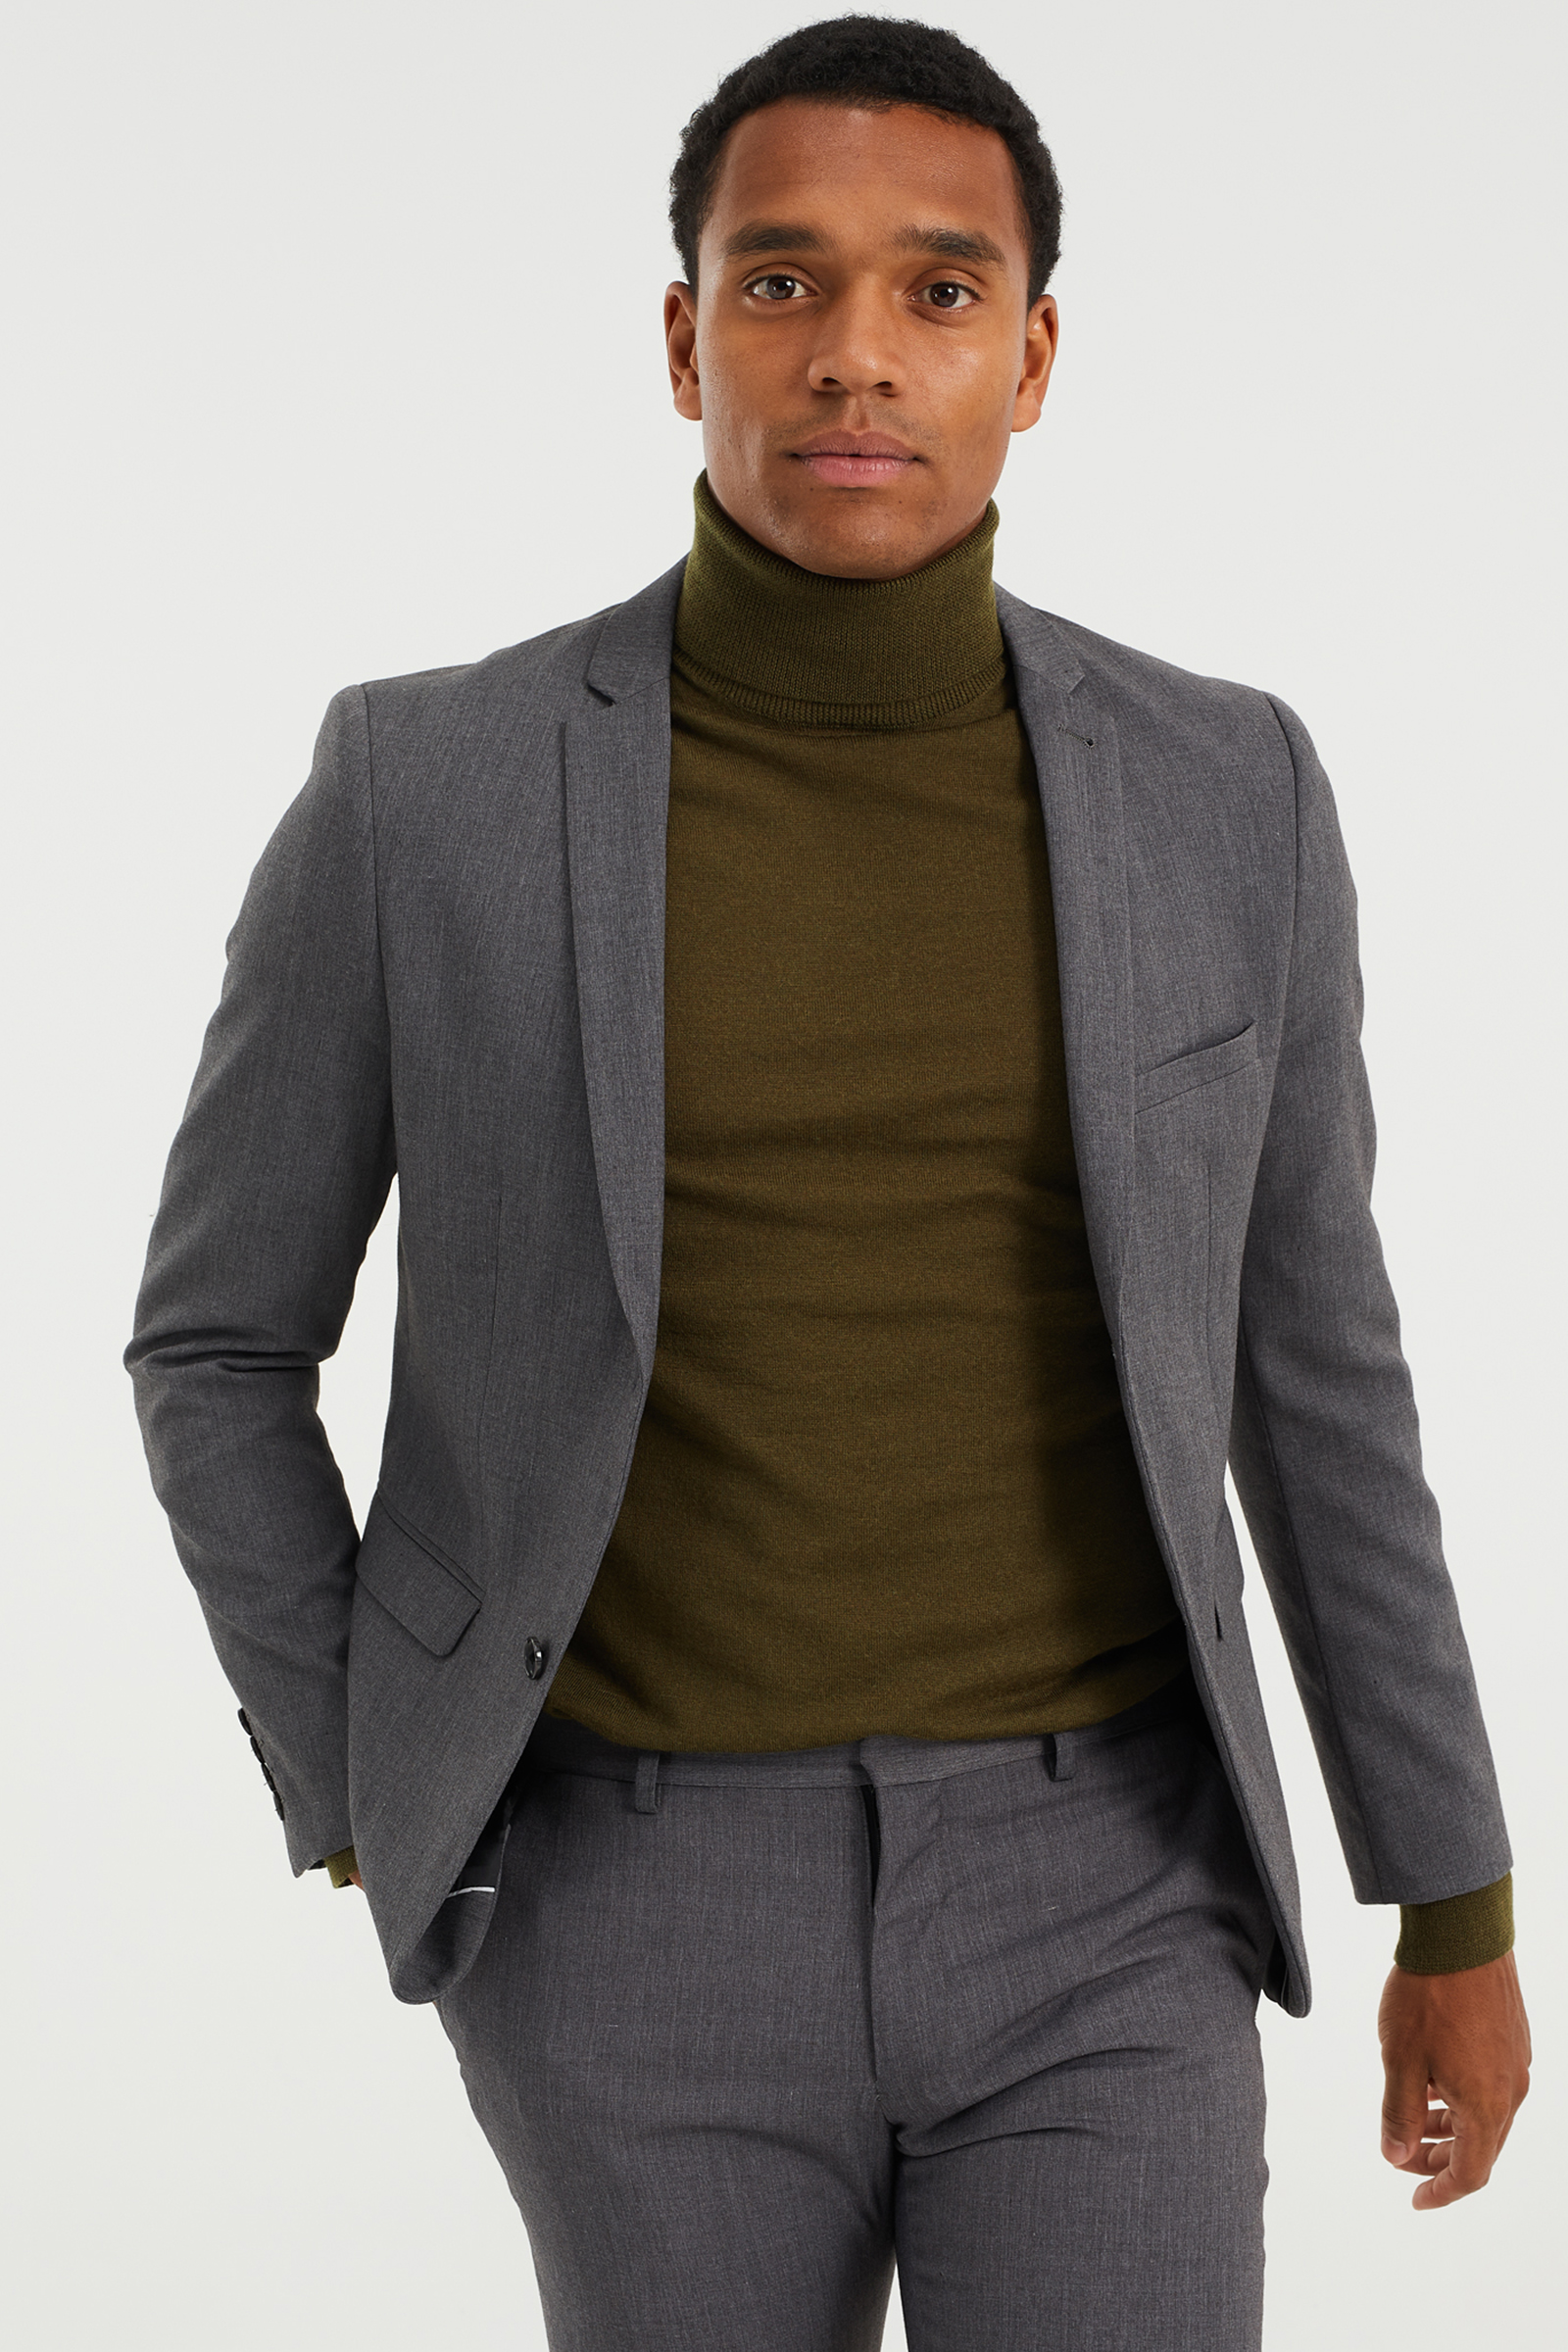 Cheap suit jacket men, Buy Quality slim fit suit jacket directly from China fit suit jacket Suppliers: S-6XL New Fashion Mens Blazer Casual Suits Slim Fit suit jacket Men Veste Homme Cotton Masculin Blazer jacket Plus Size Enjoy Free Shipping Worldwide! Limited Time Sale Easy Return/5(8).